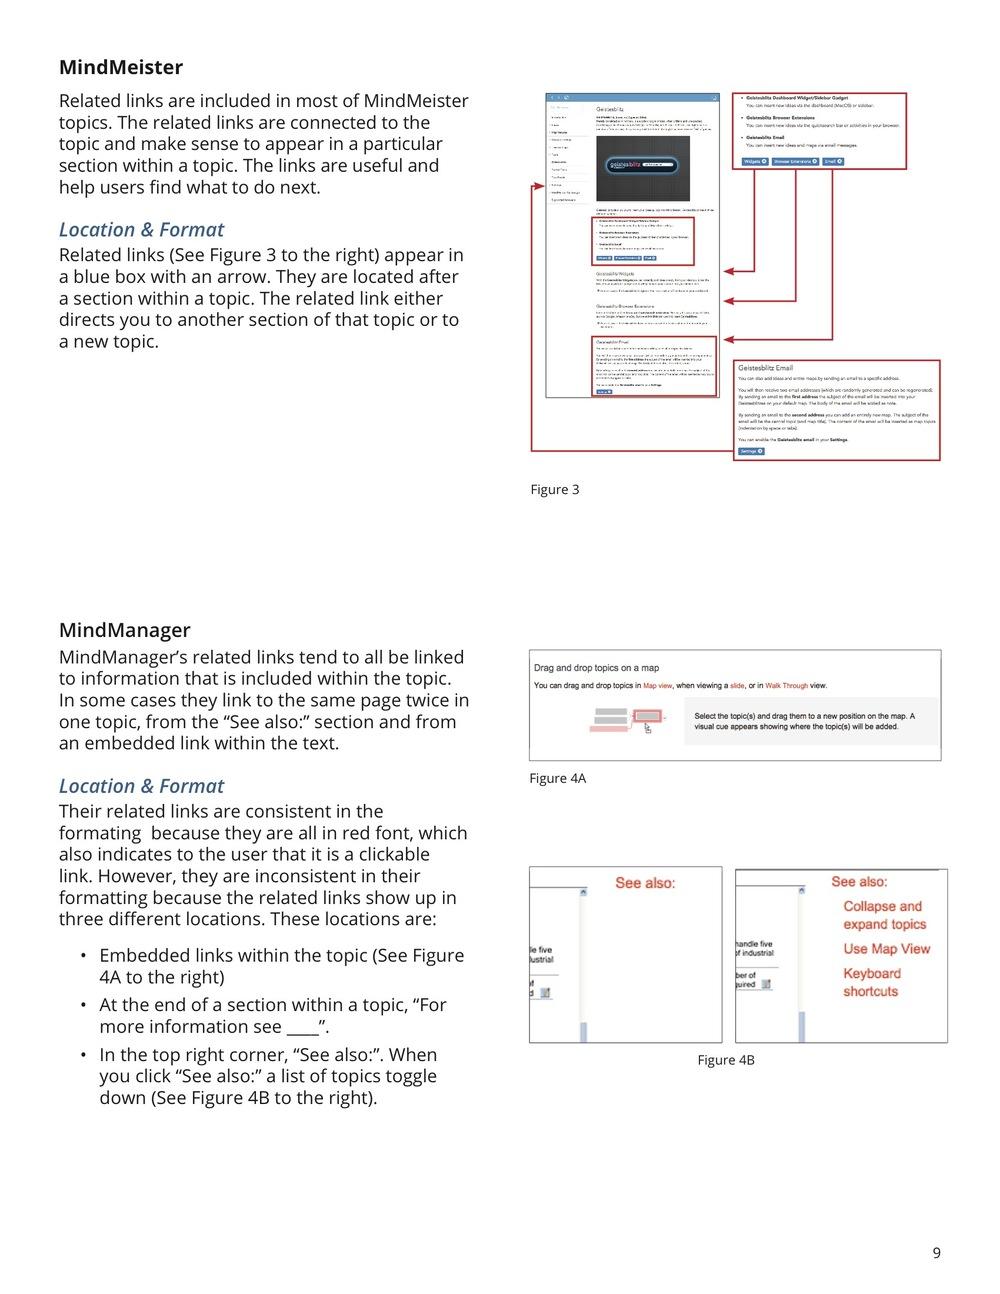 XMind Final Report_4-23-15 9-9.jpeg